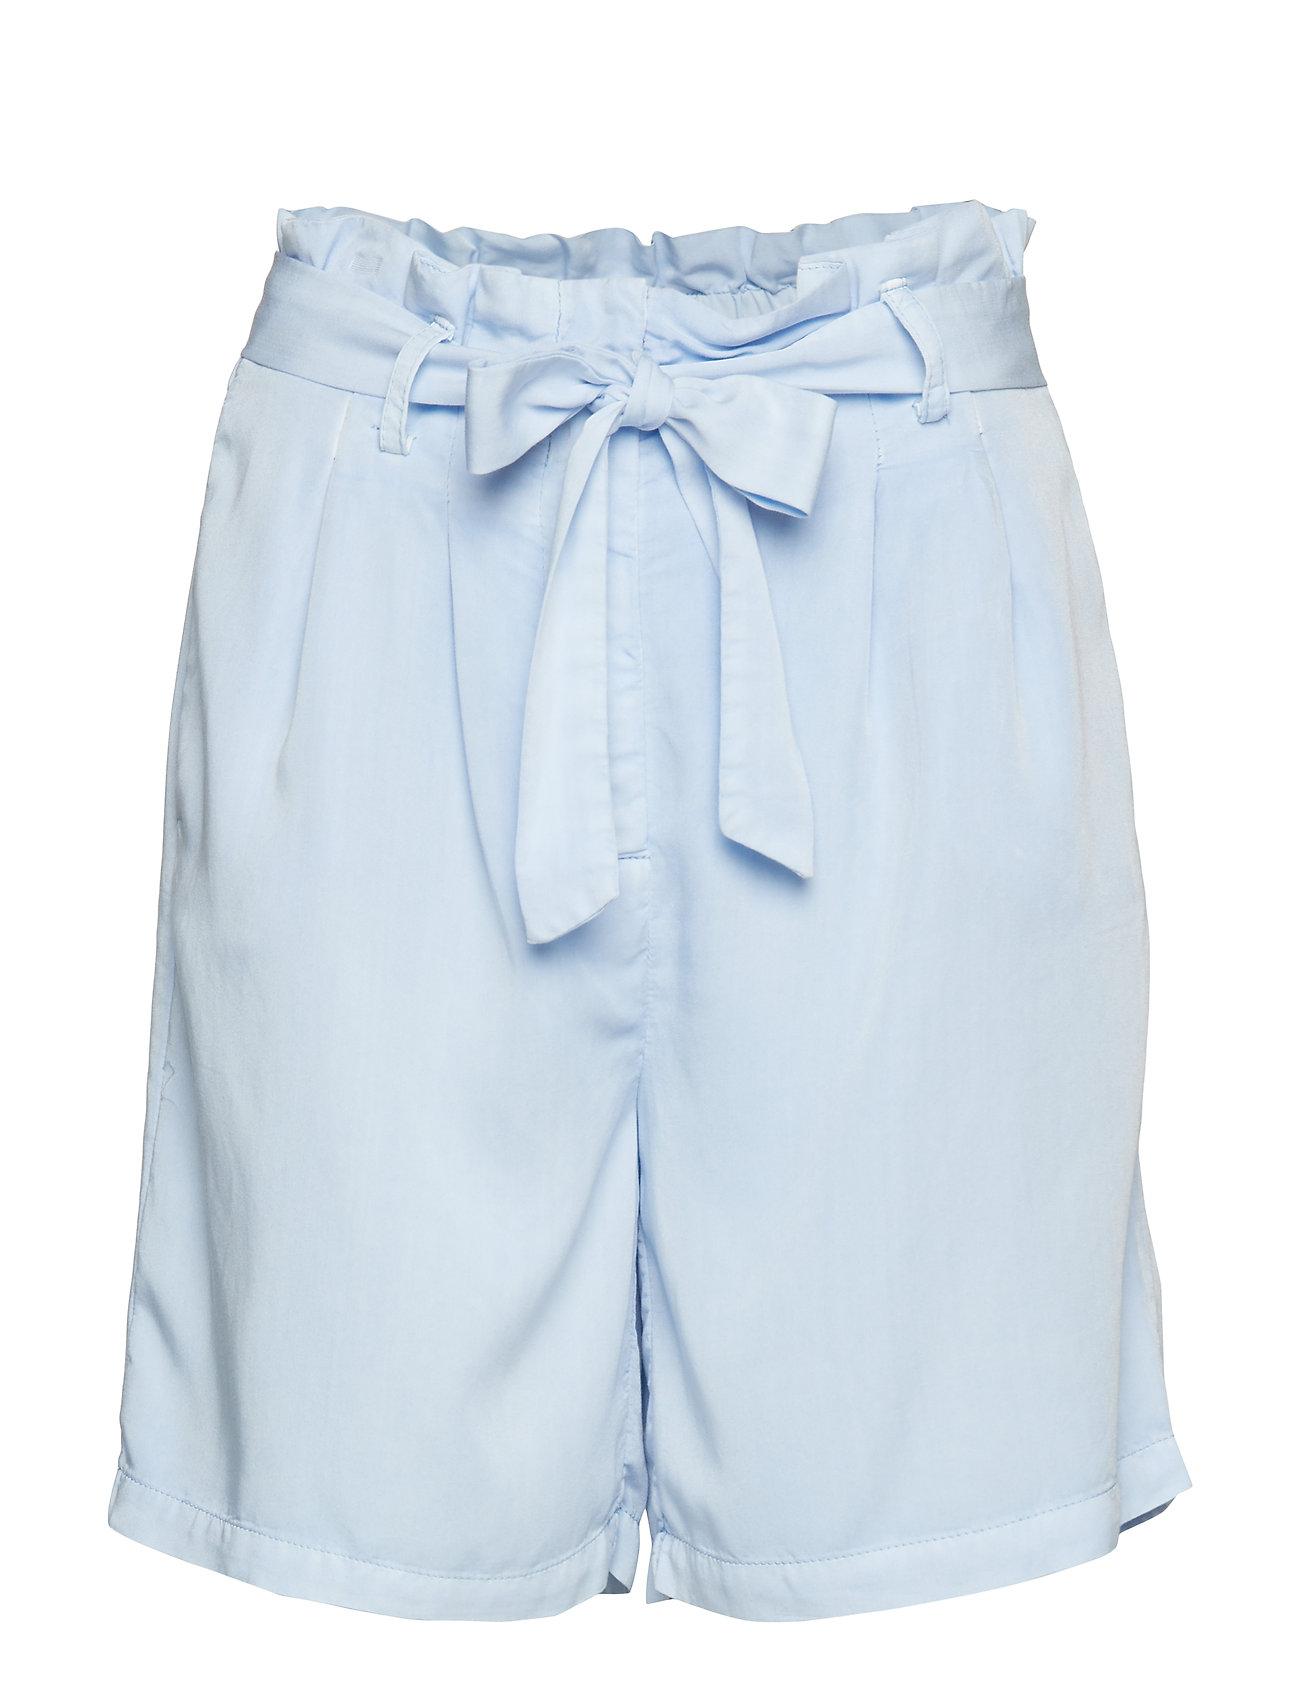 Modström Ocean shorts - BLUE WASH